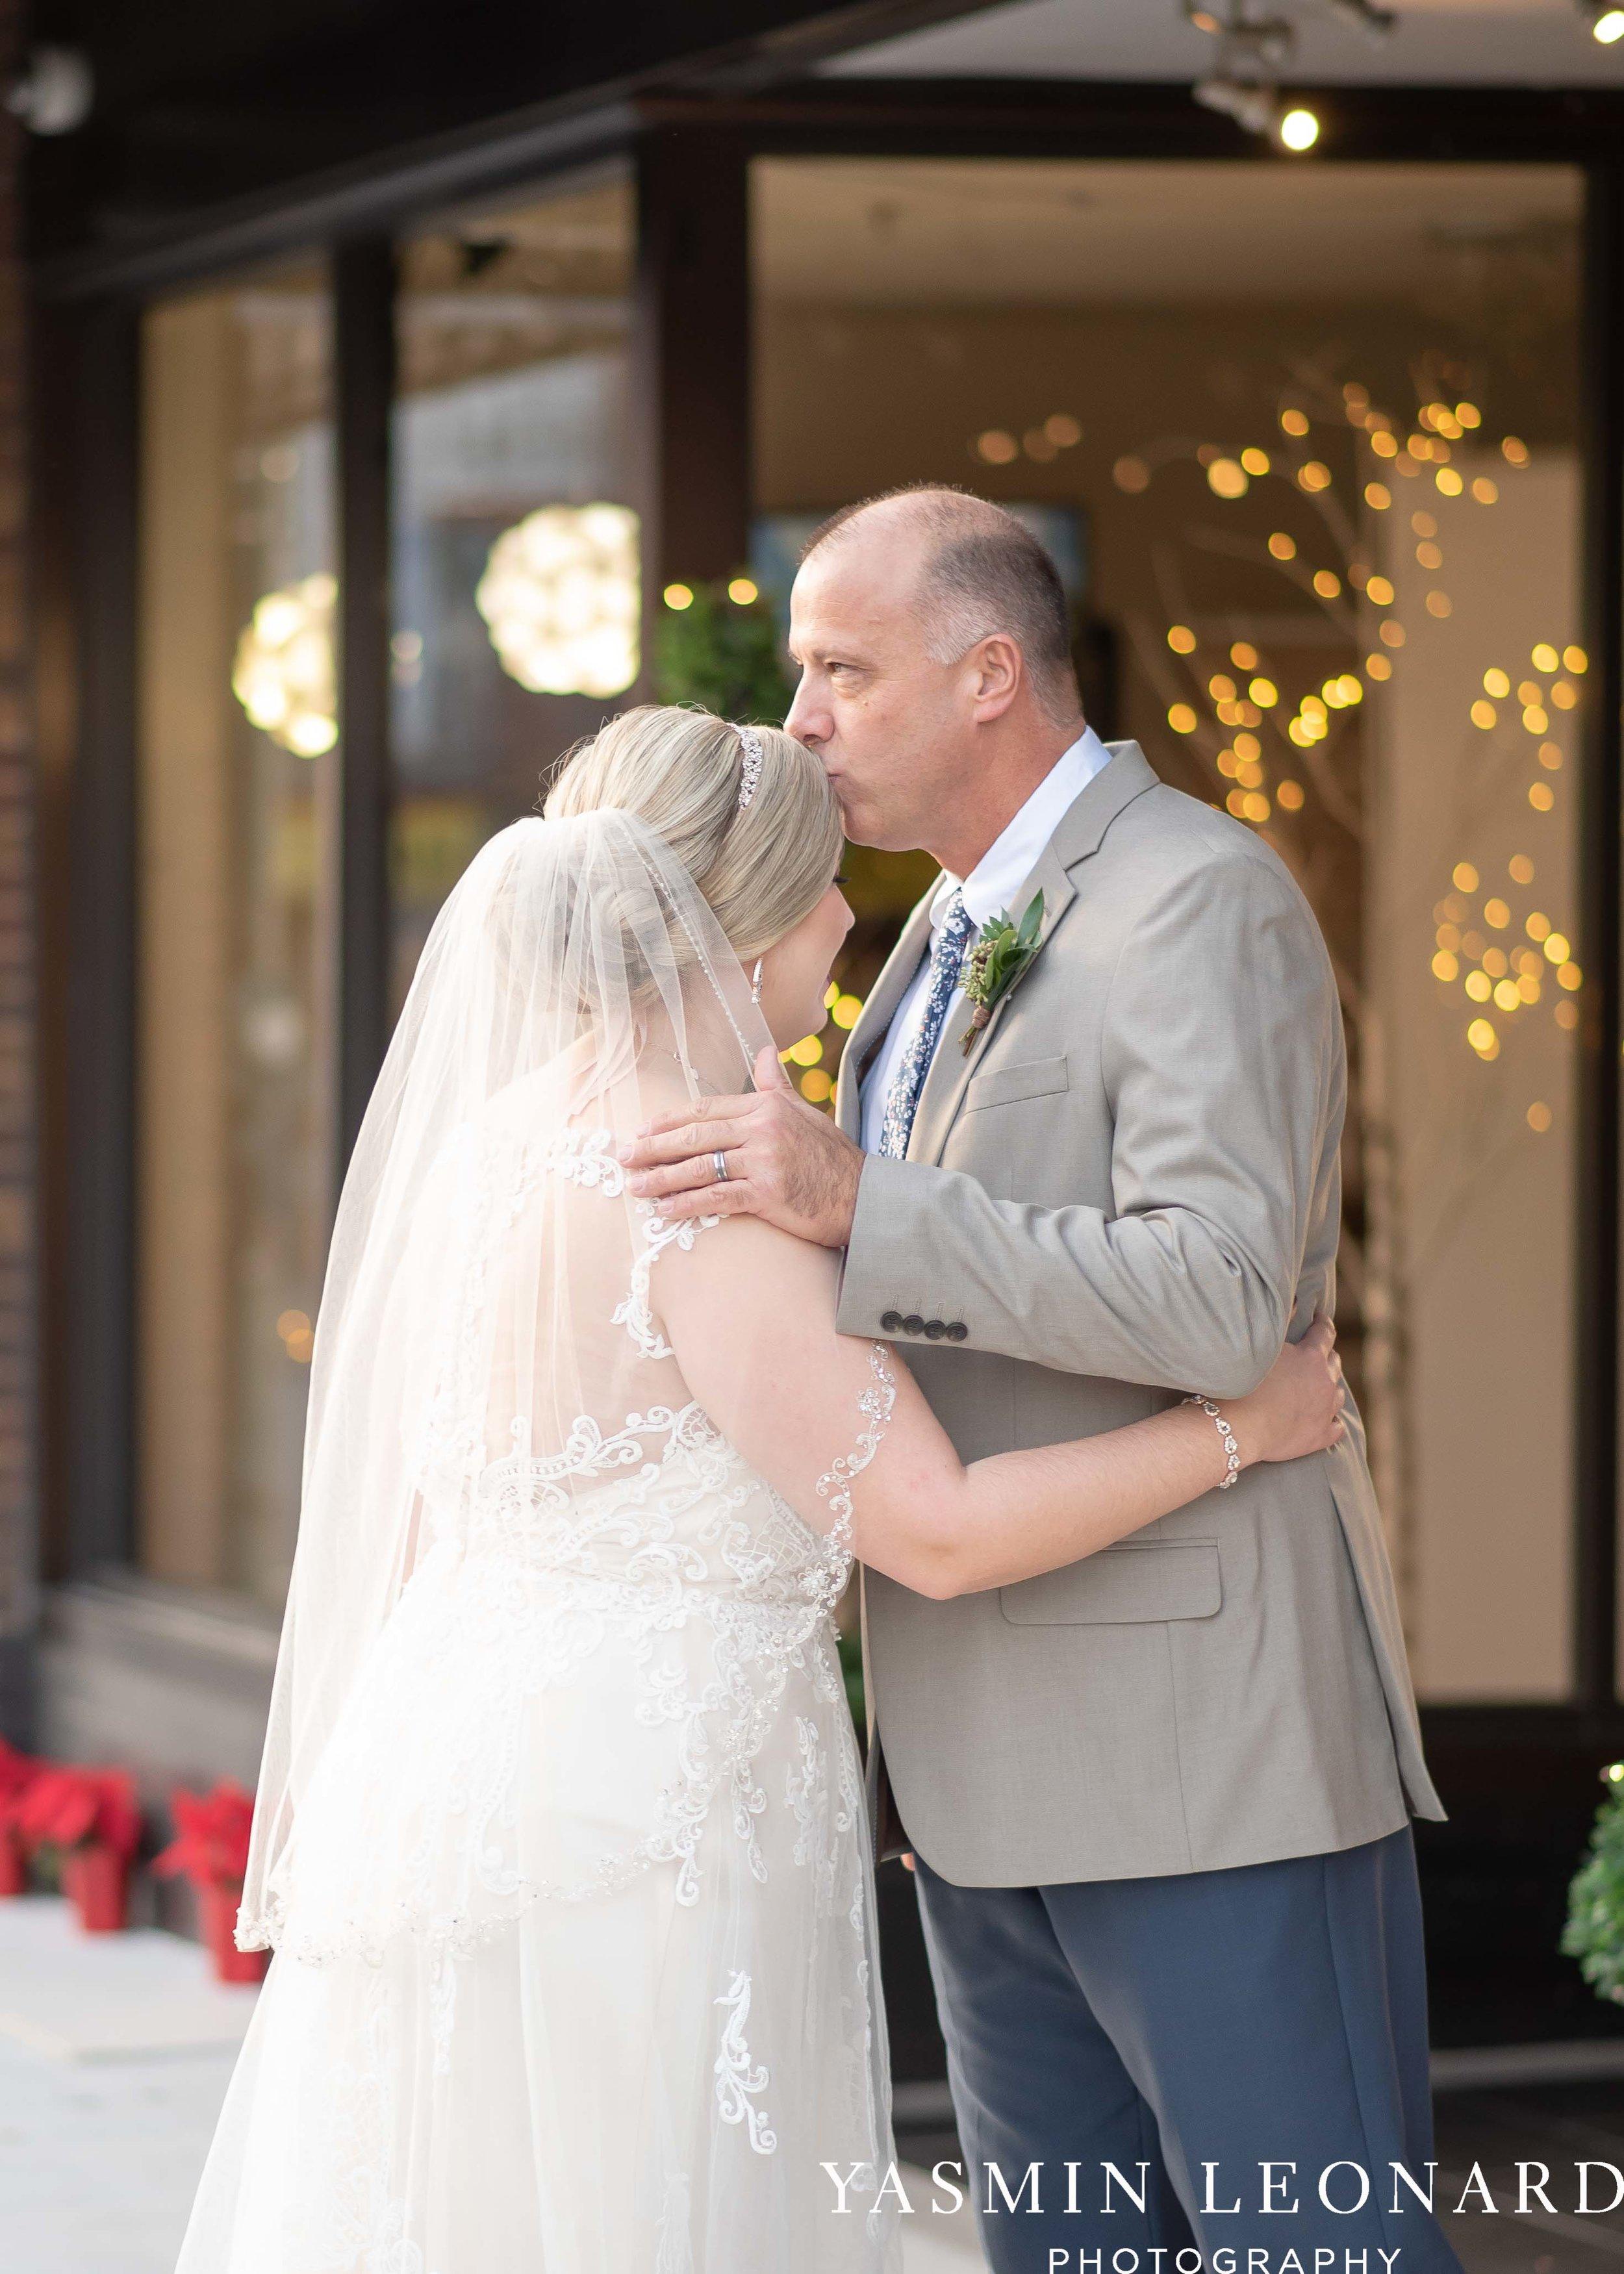 Rebekah and Matt - 105 Worth Event Centre - Yasmin Leonard Photography - Asheboro Wedding - NC Wedding - High Point Weddings - Triad Weddings - Winter Wedding-20.jpg